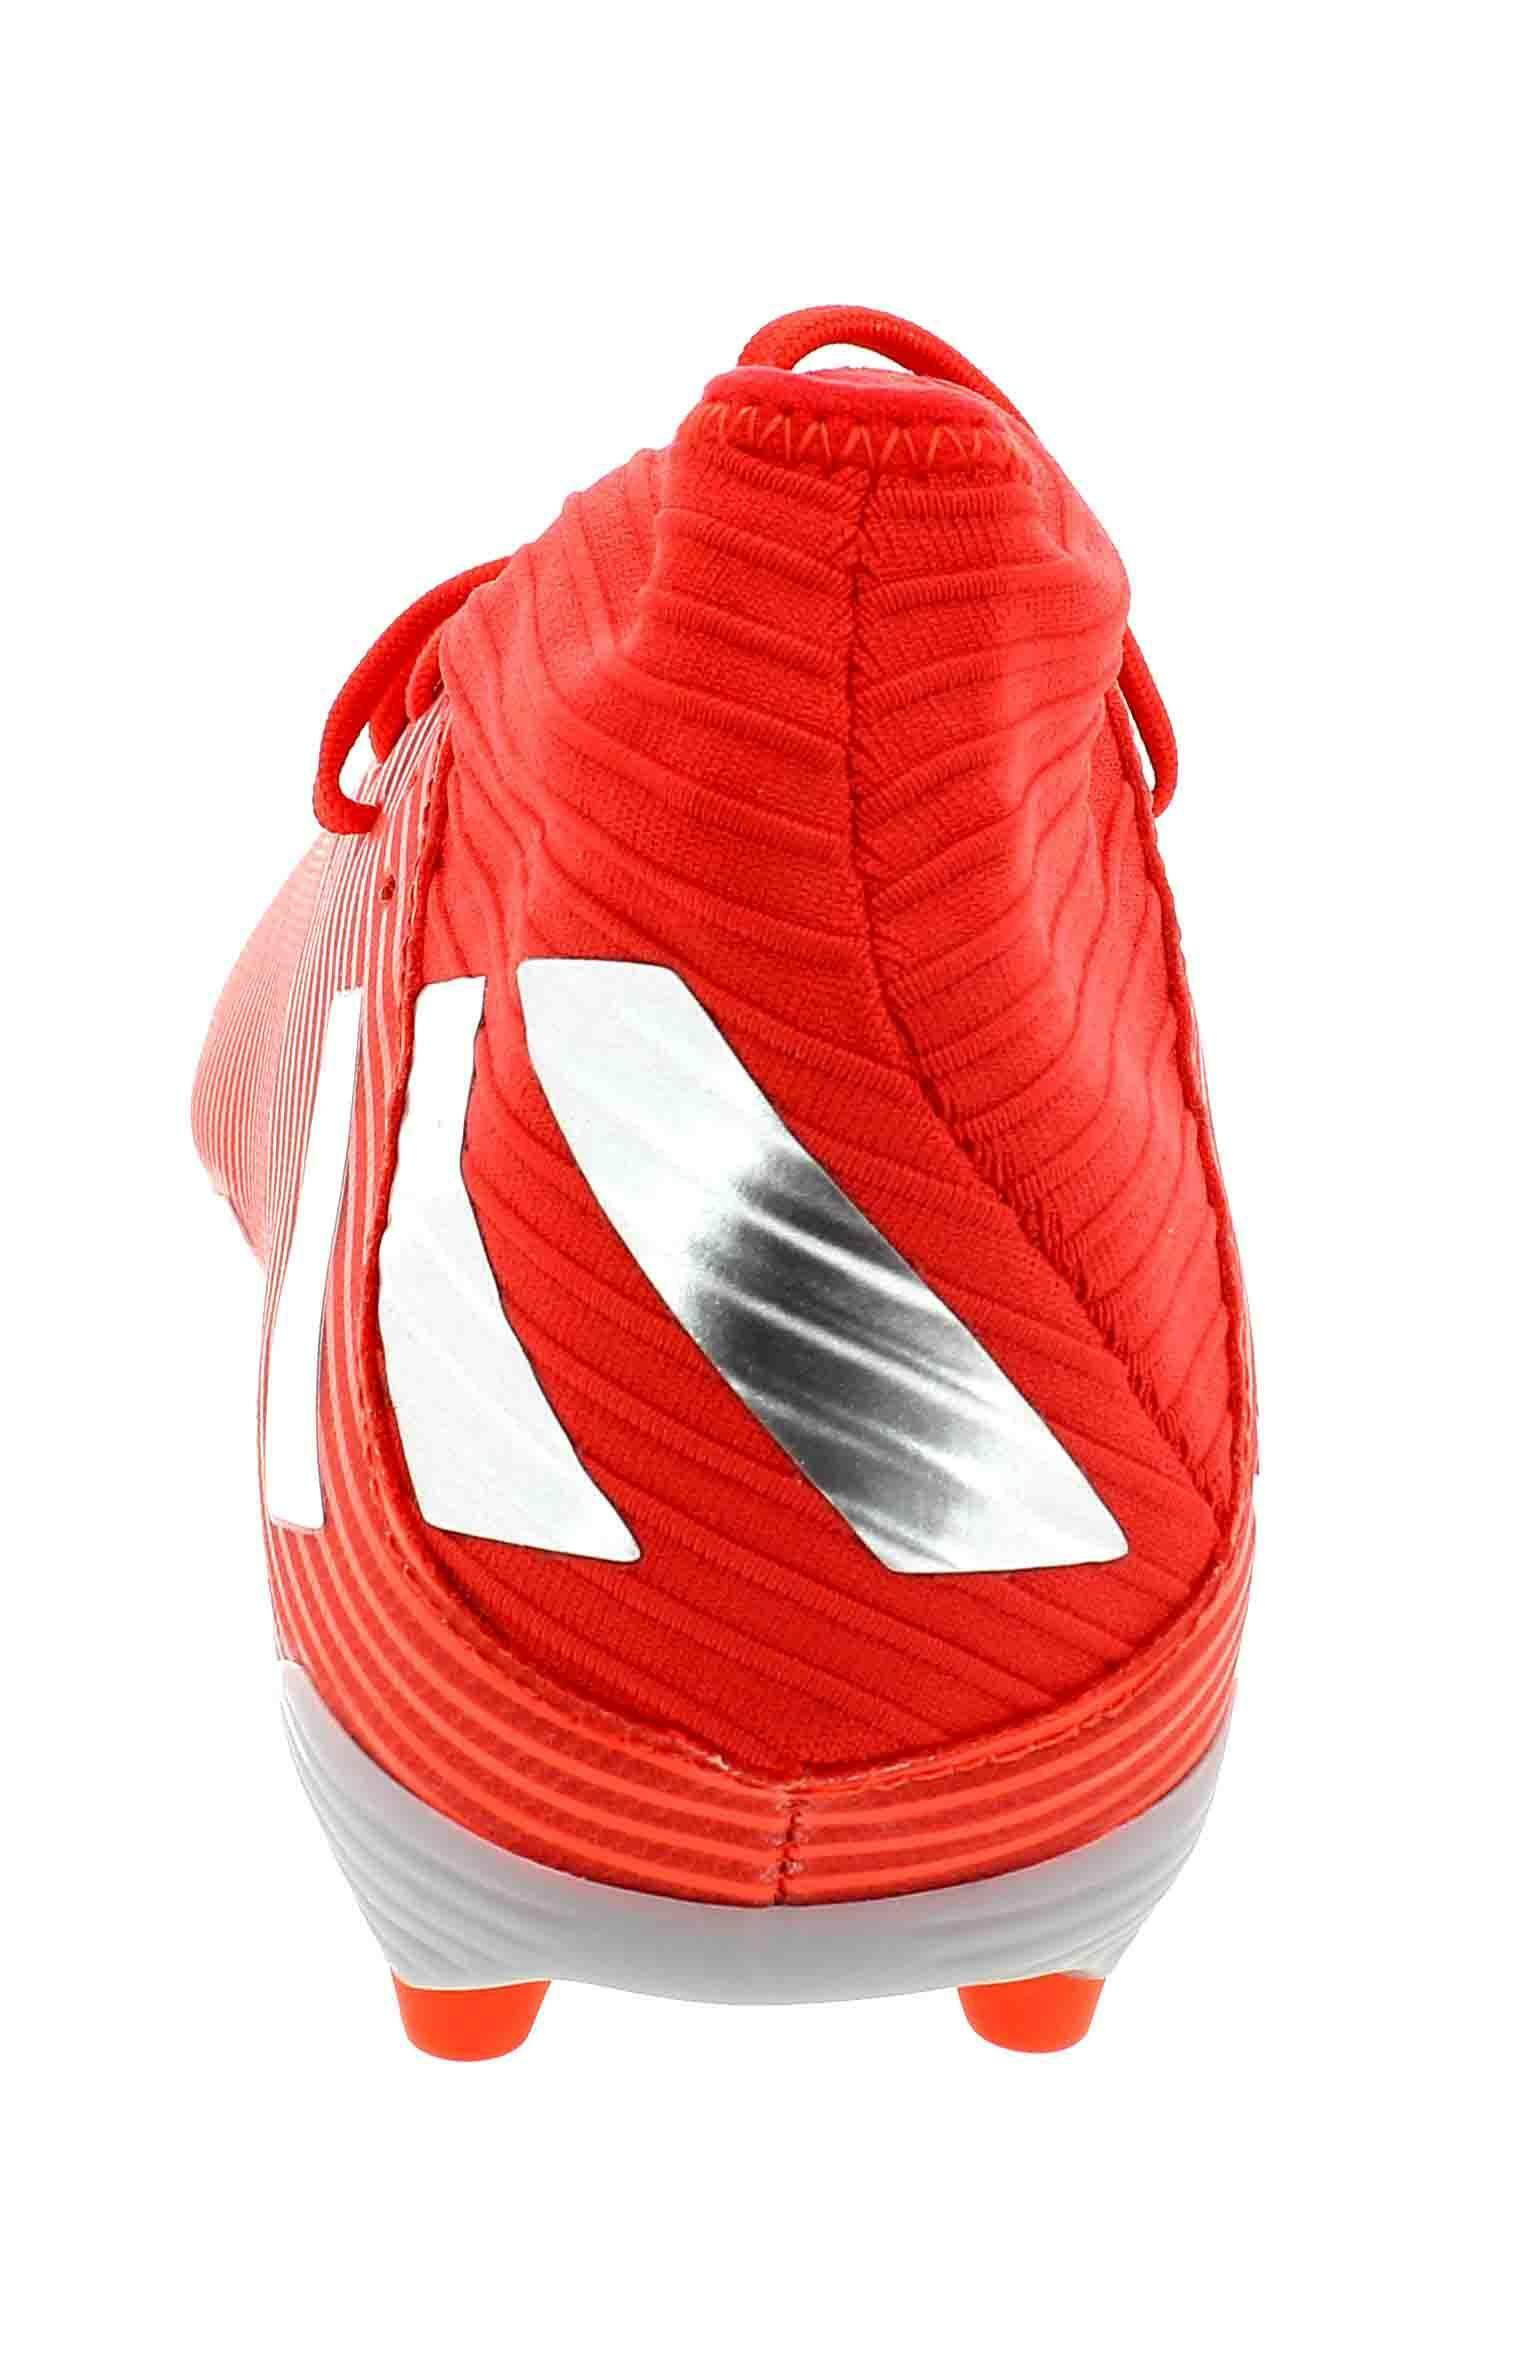 adidas nemeziz 19.3 fg scarpe calcio uomo rossi f34389